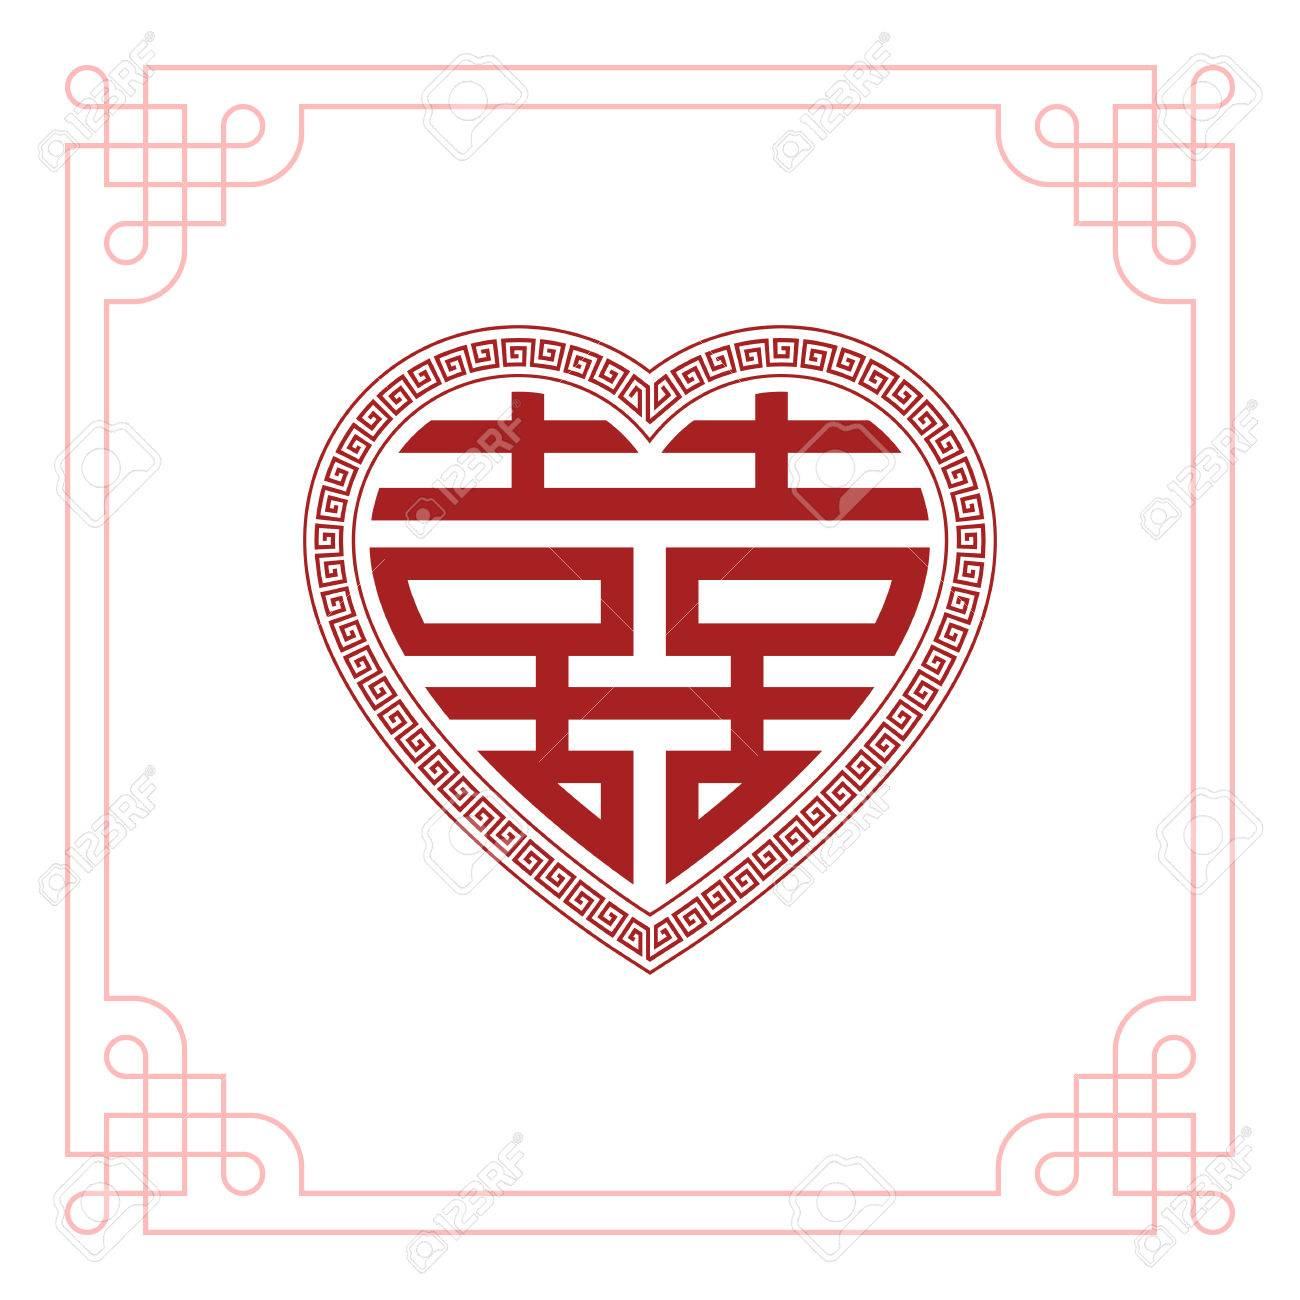 Double happiness chinese character in heart shape with frame double happiness chinese character in heart shape with frame for decoration in chinese traditional wedding buycottarizona